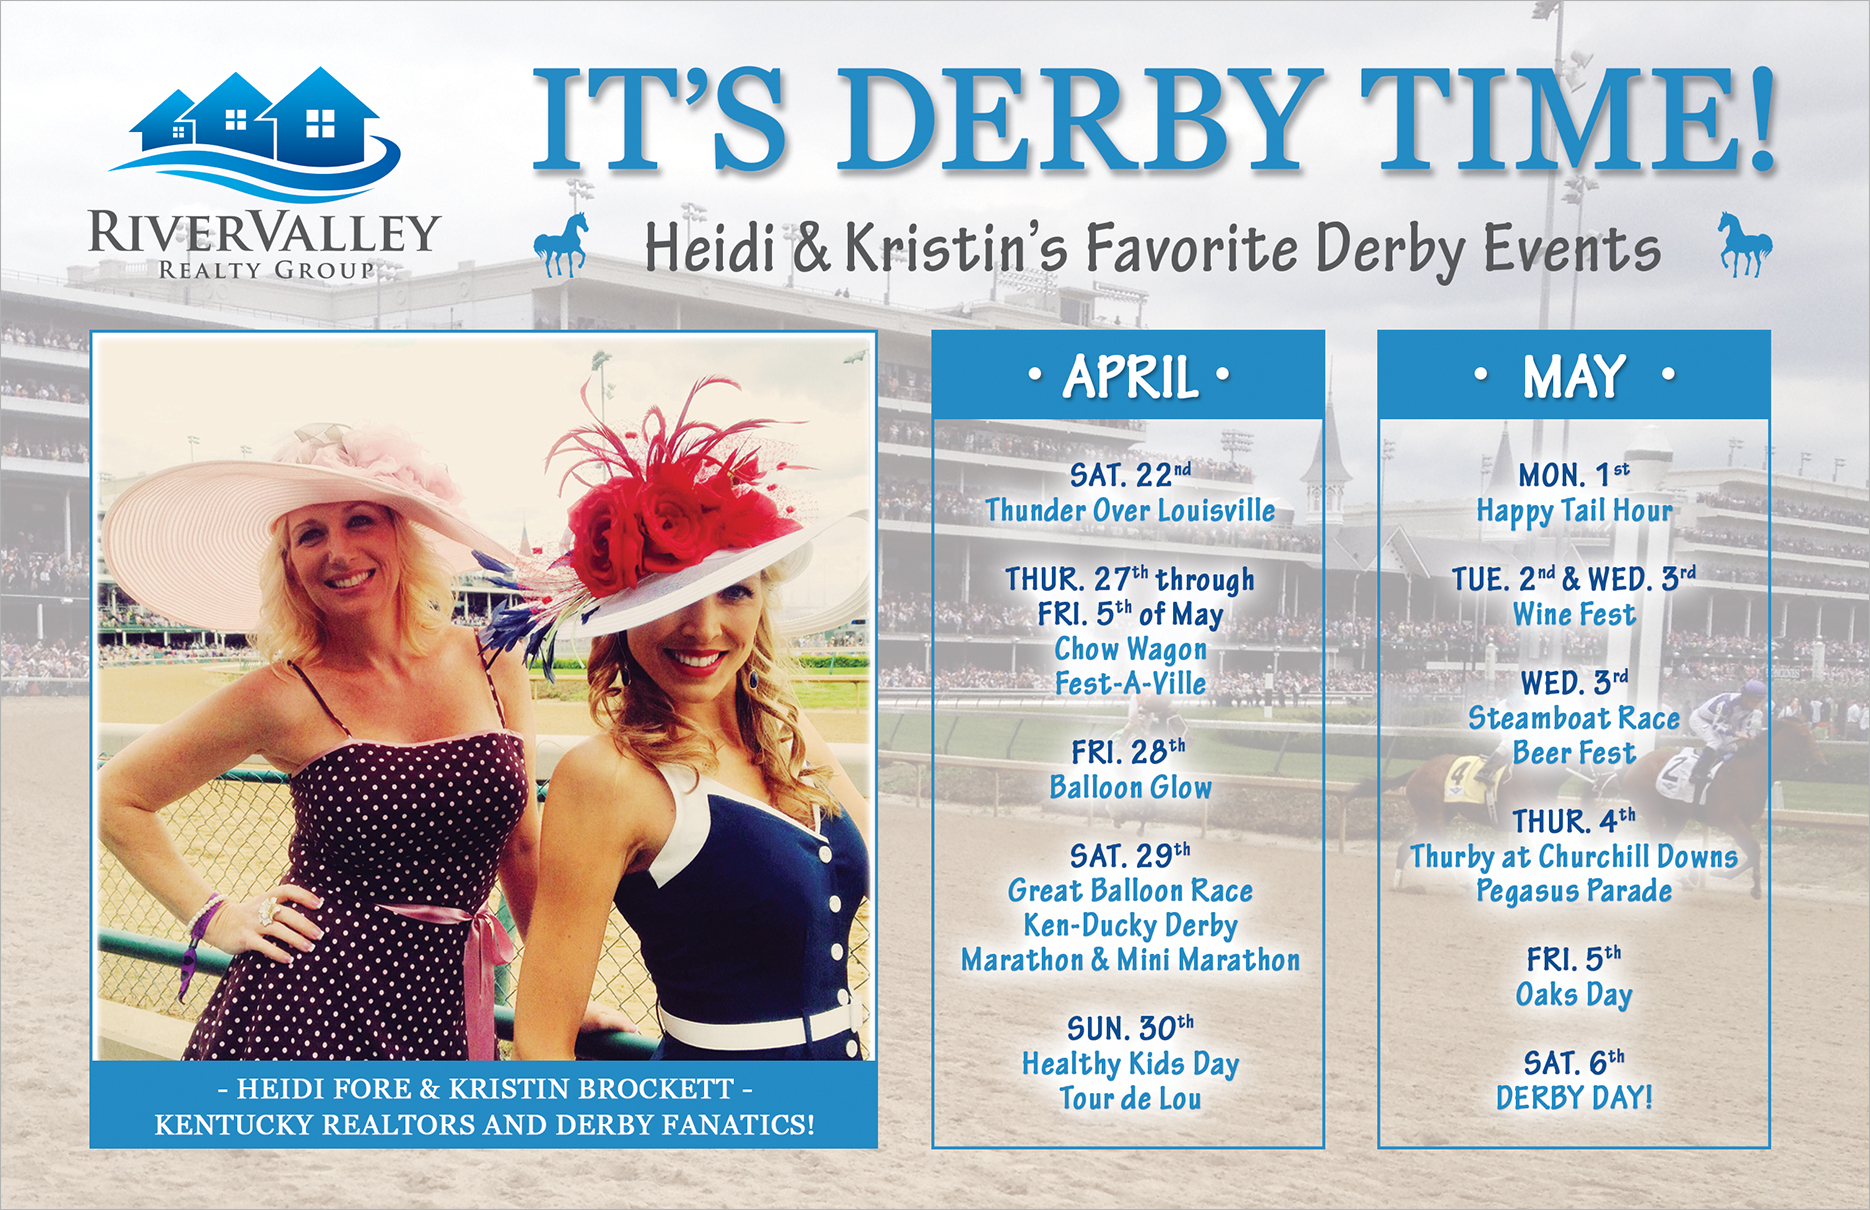 Heidi Fore & Kristin Brockett's Favorite Derby Events!